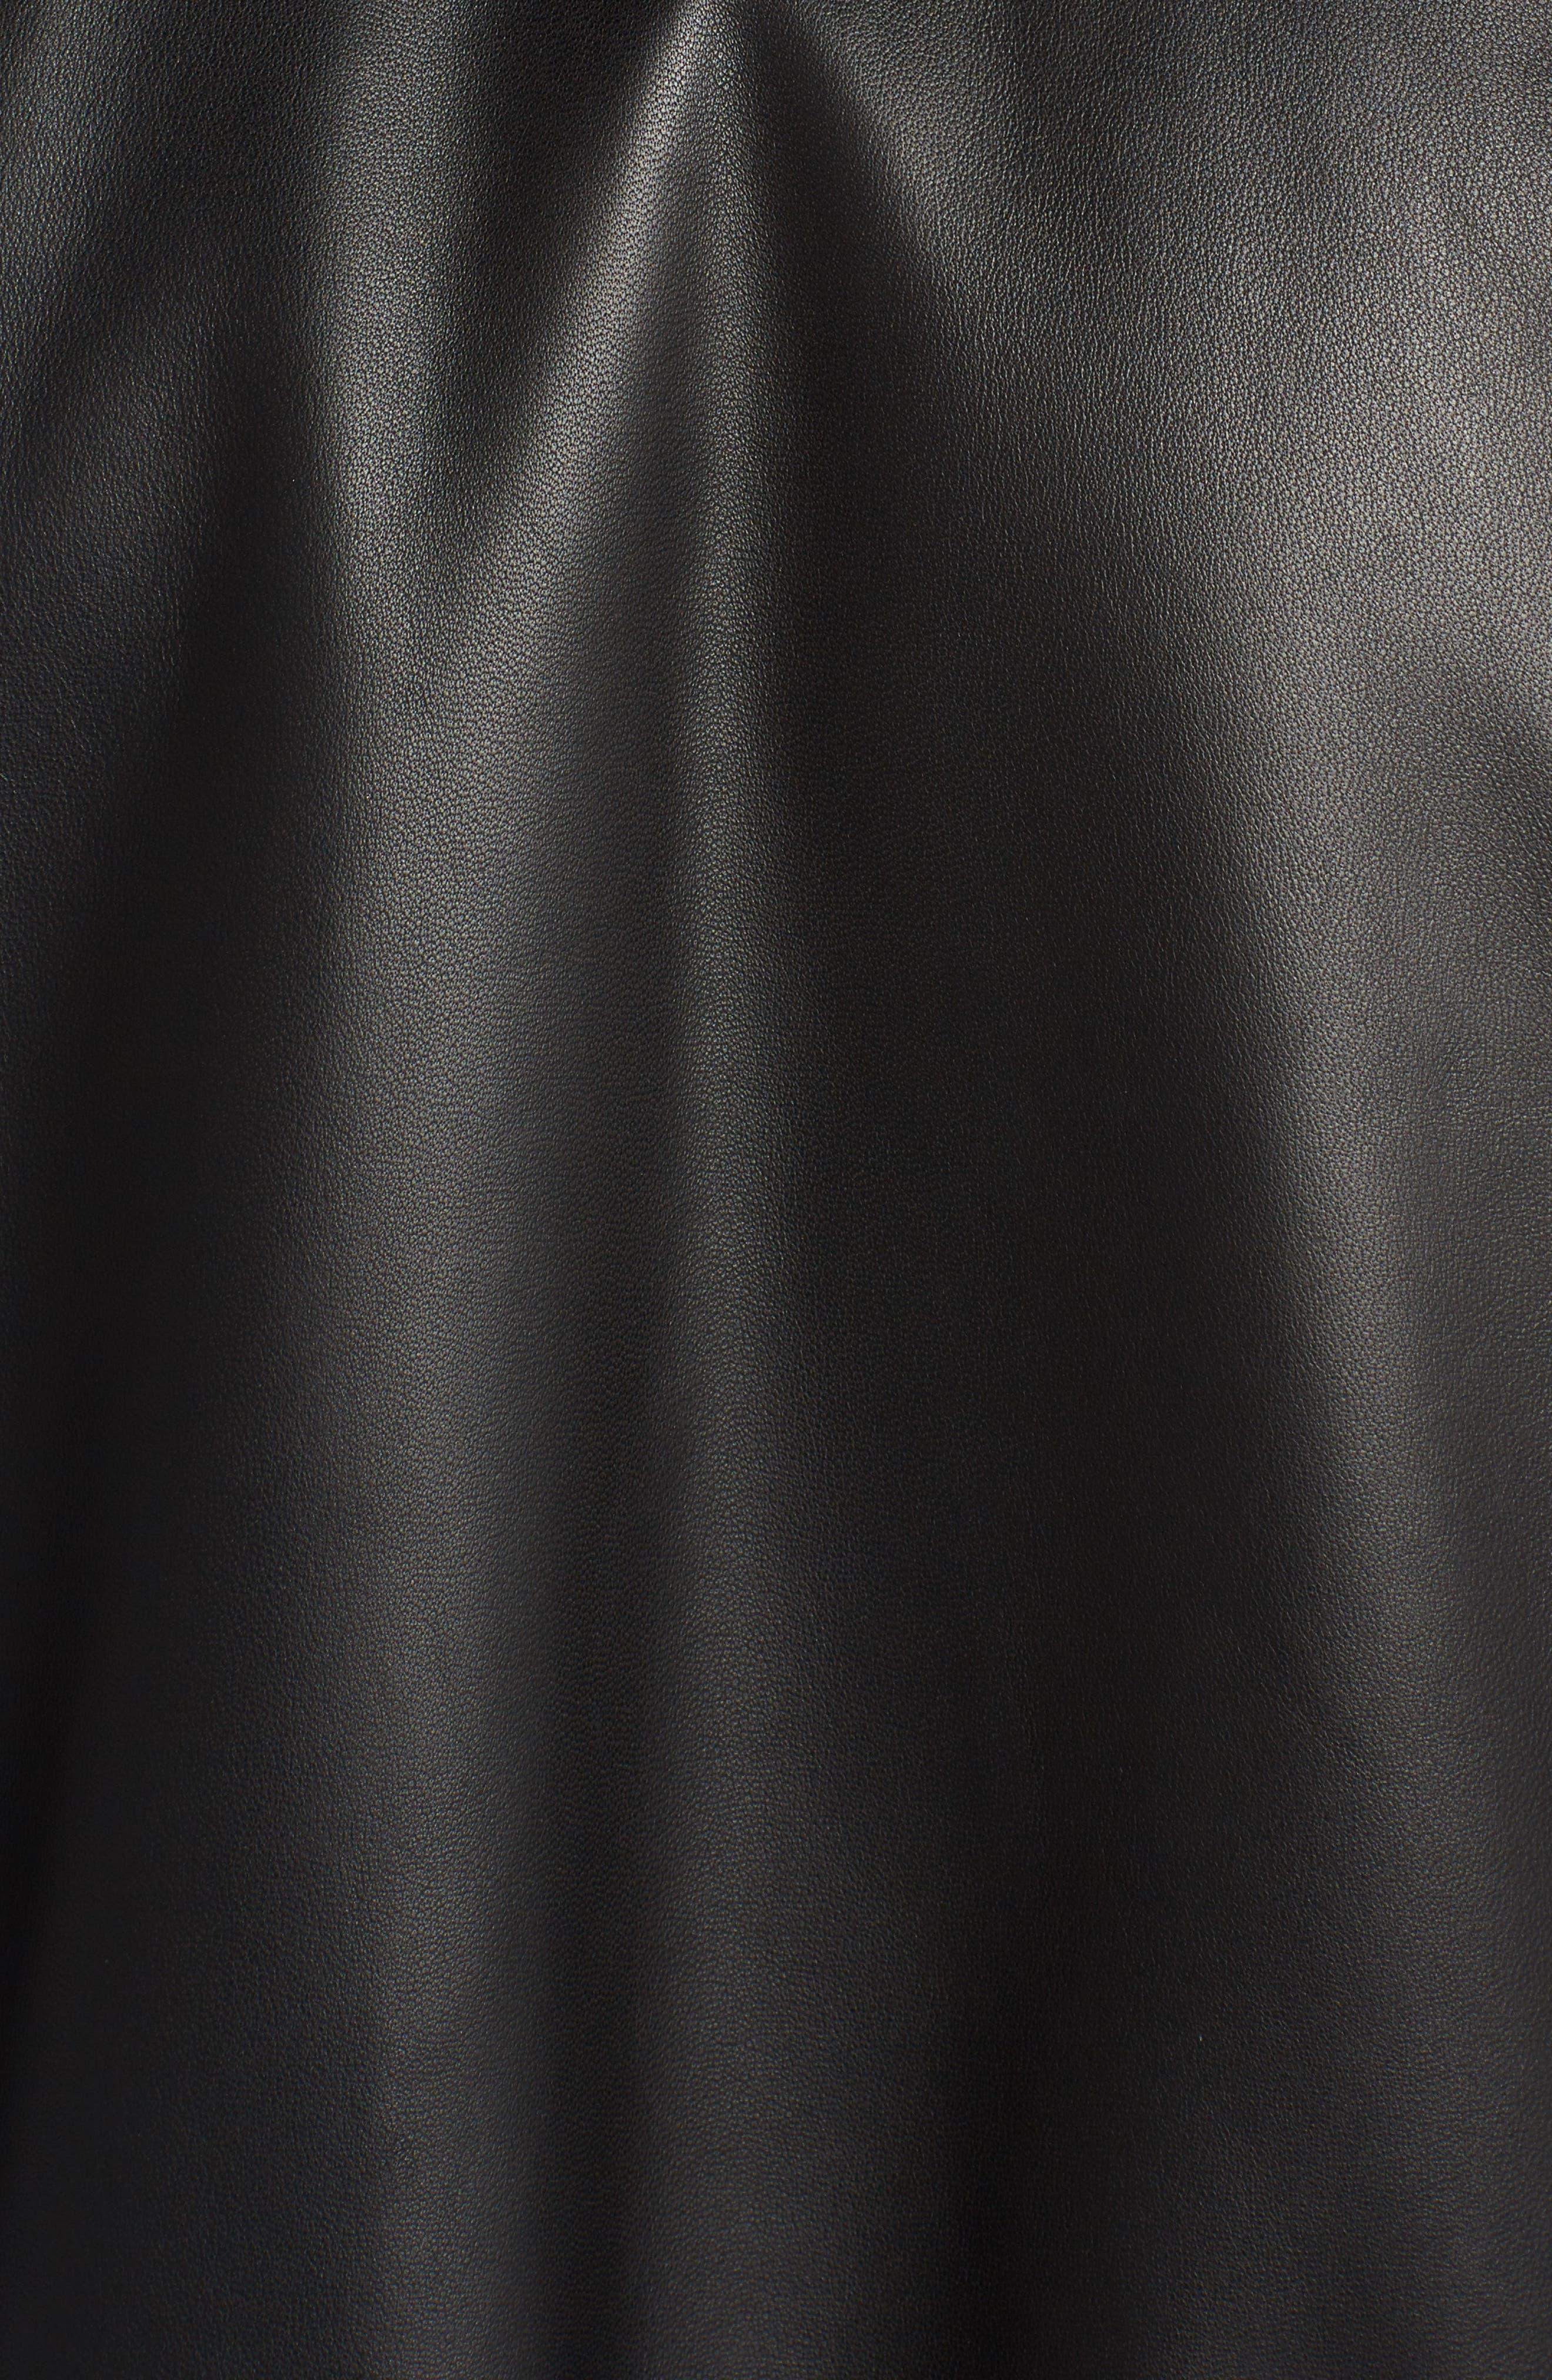 Embellished Bow Leather Bomber,                             Alternate thumbnail 5, color,                             Black